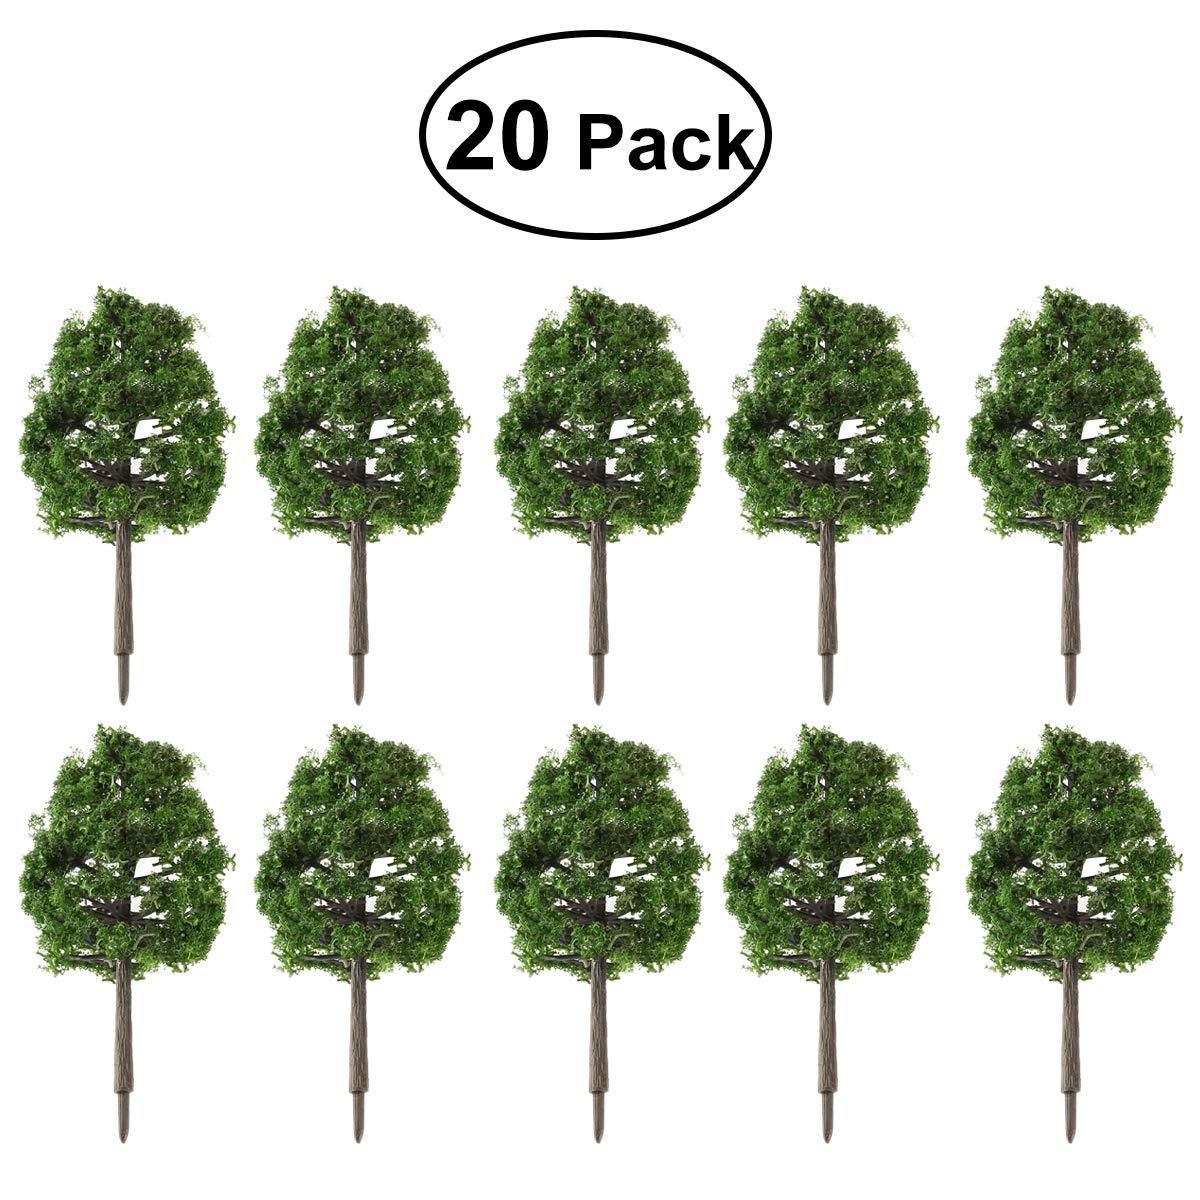 WINOMO 20pcs Model Trees Miniature Landscape Scenery Train Railways Trees Scale 1:100 Dark Green by WINOMO